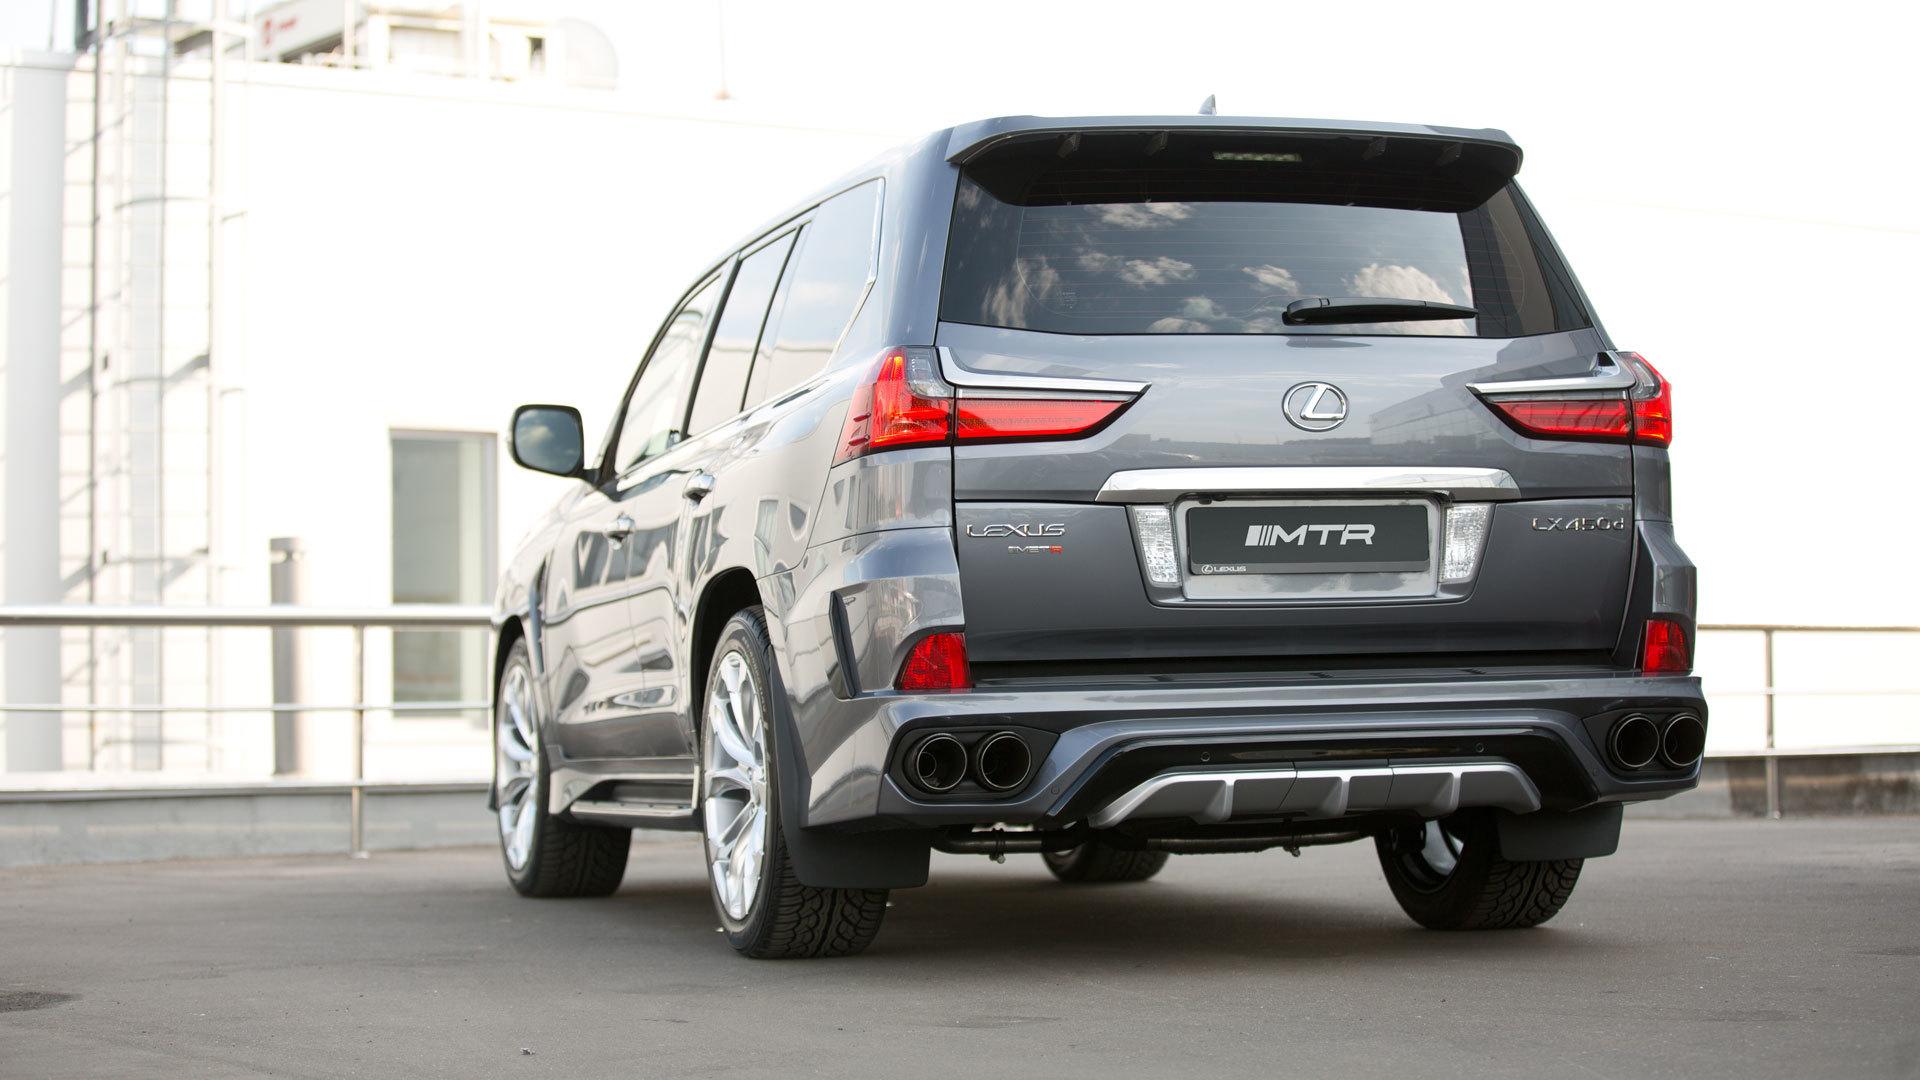 MTR Design Body kit for Lexus LX 570 carbon fiber